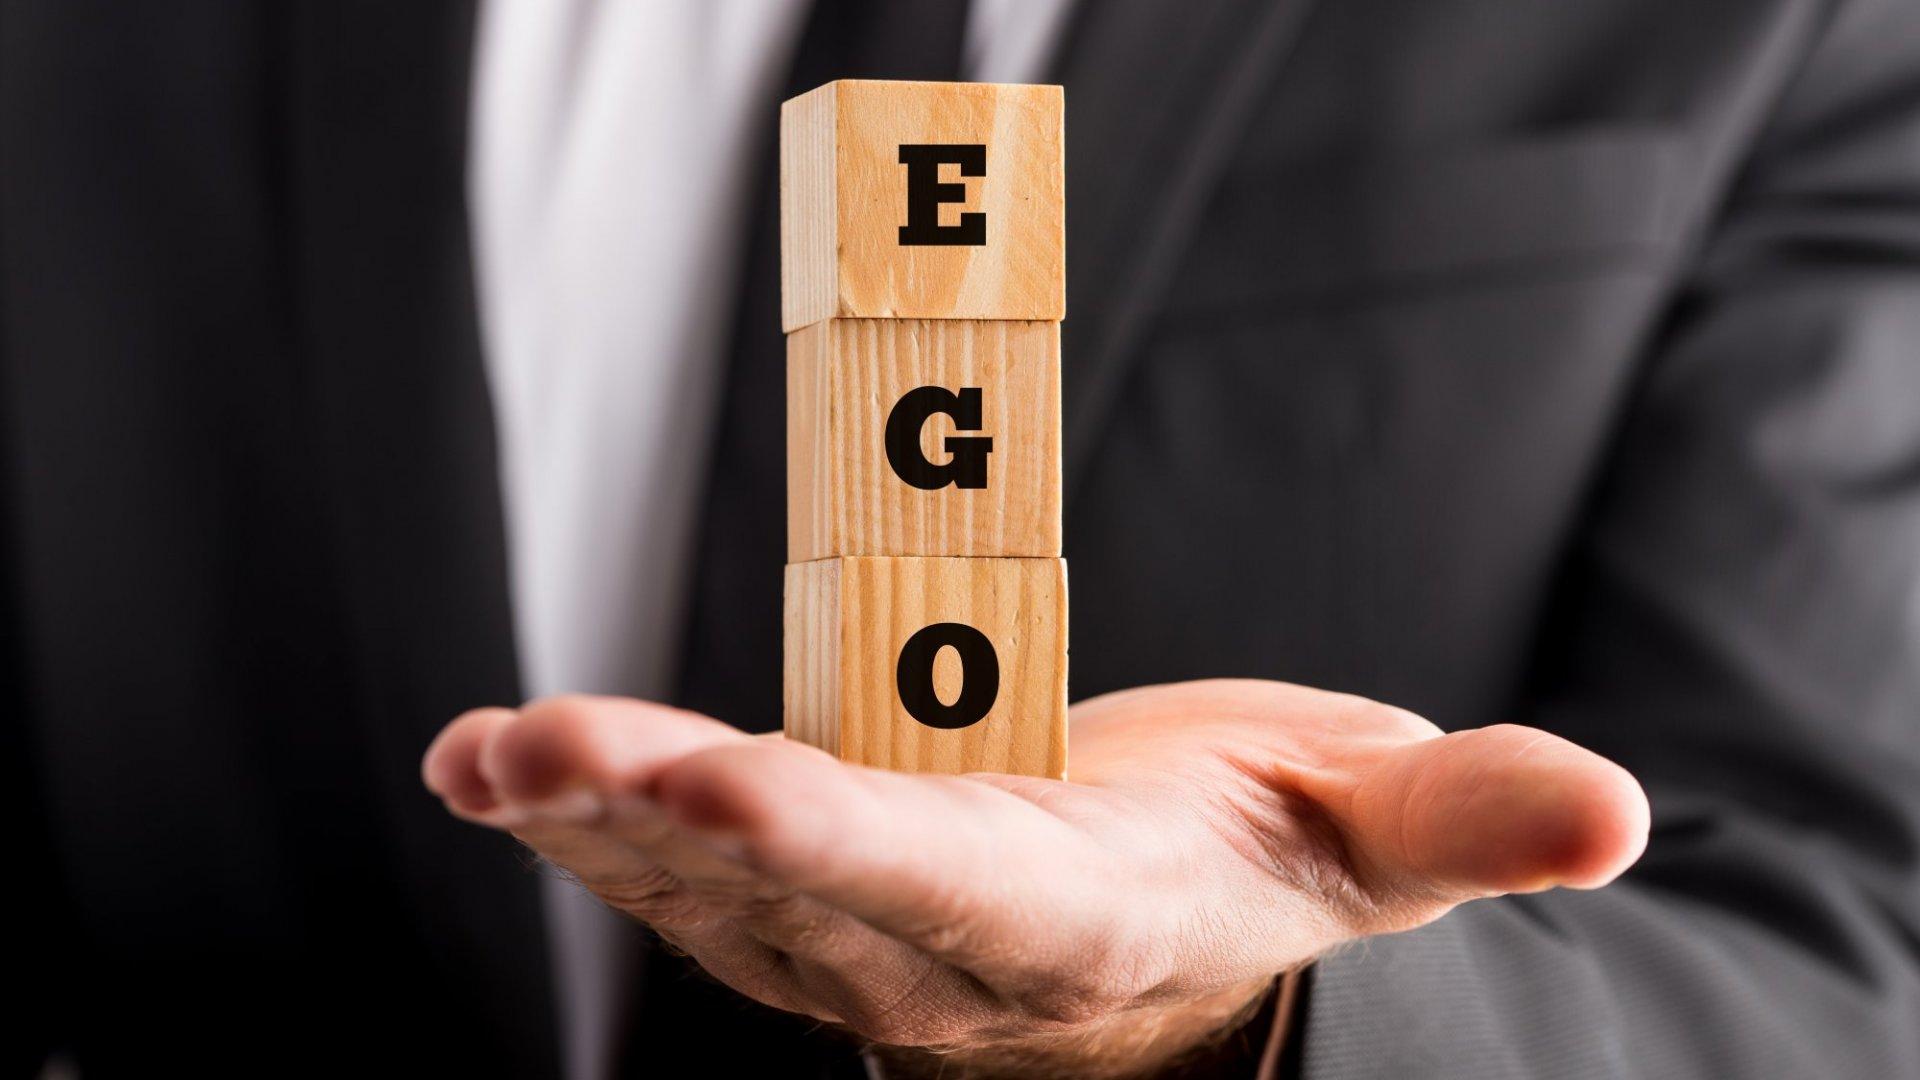 Pragmatic Leaders Avoid the Five Ego Traps